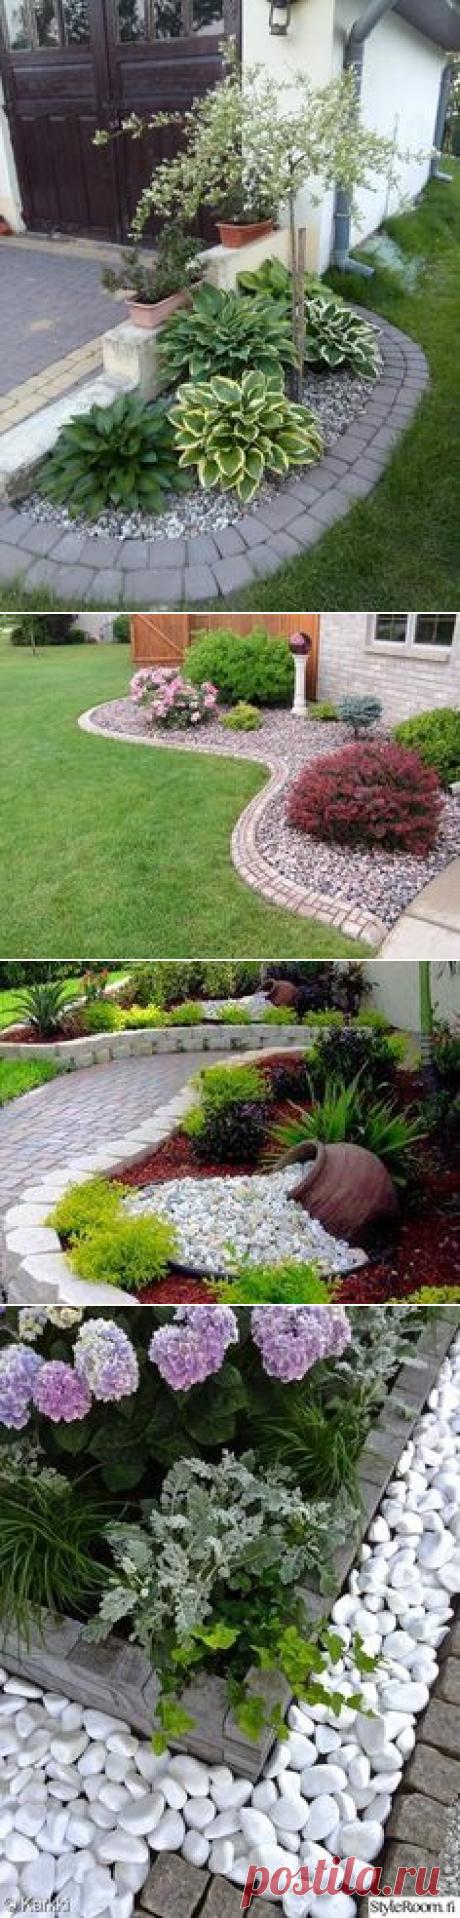 (300) Front garden idea | outside